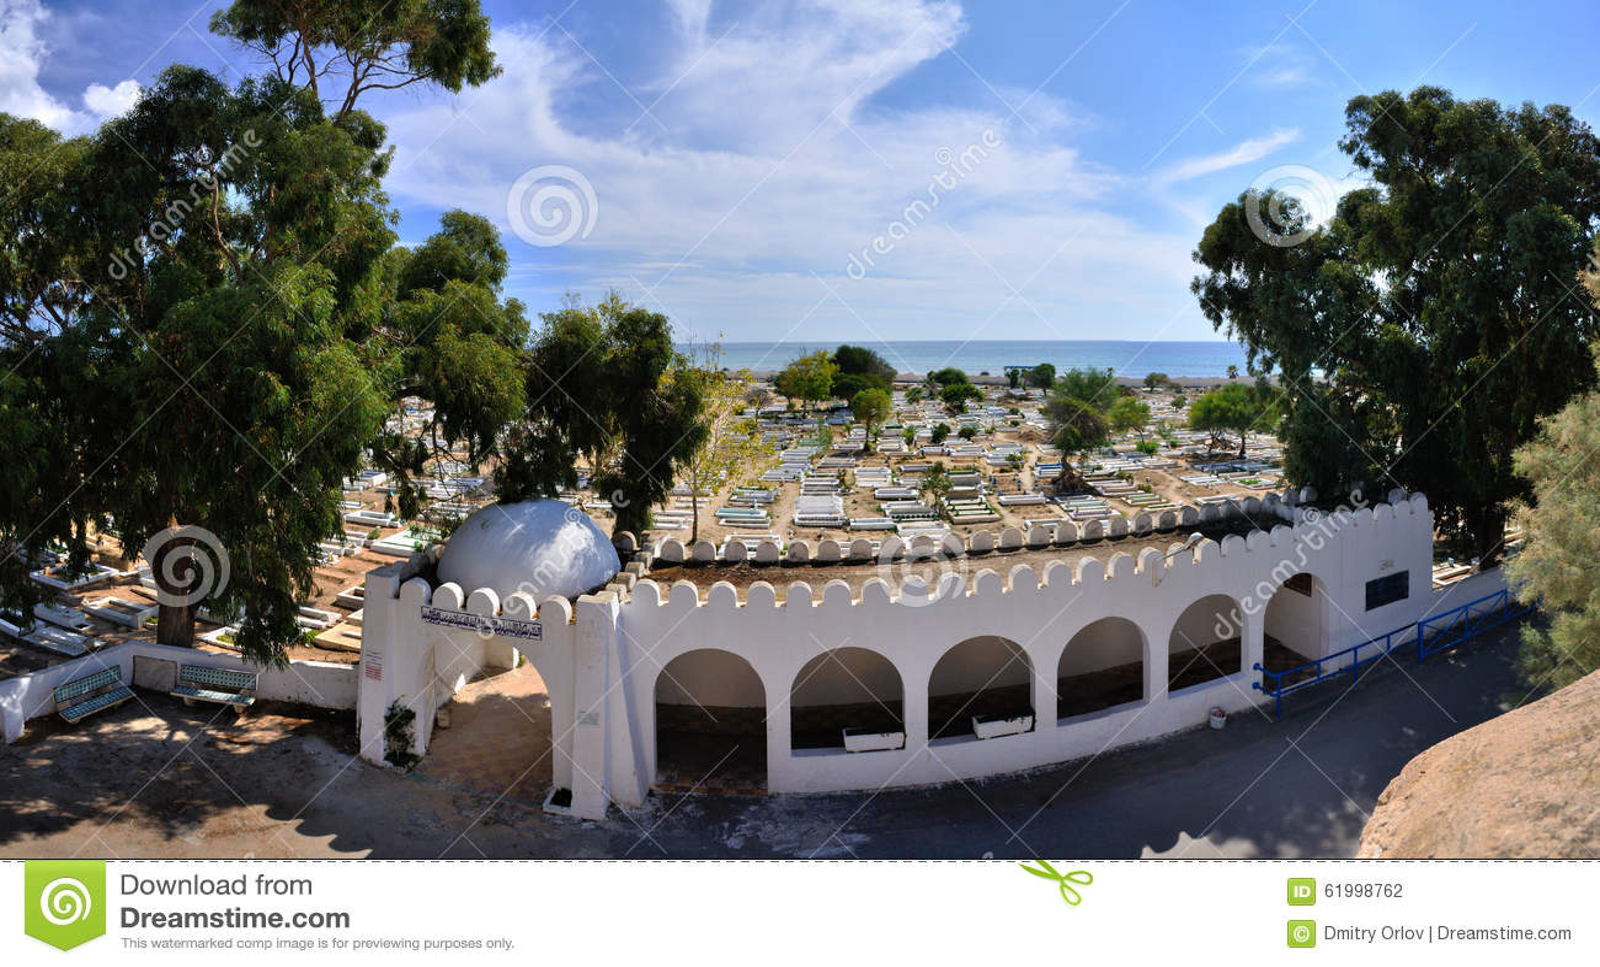 Cementerio antiguo cerca de Medina, Hammamet, Túnez, S mediterráneo